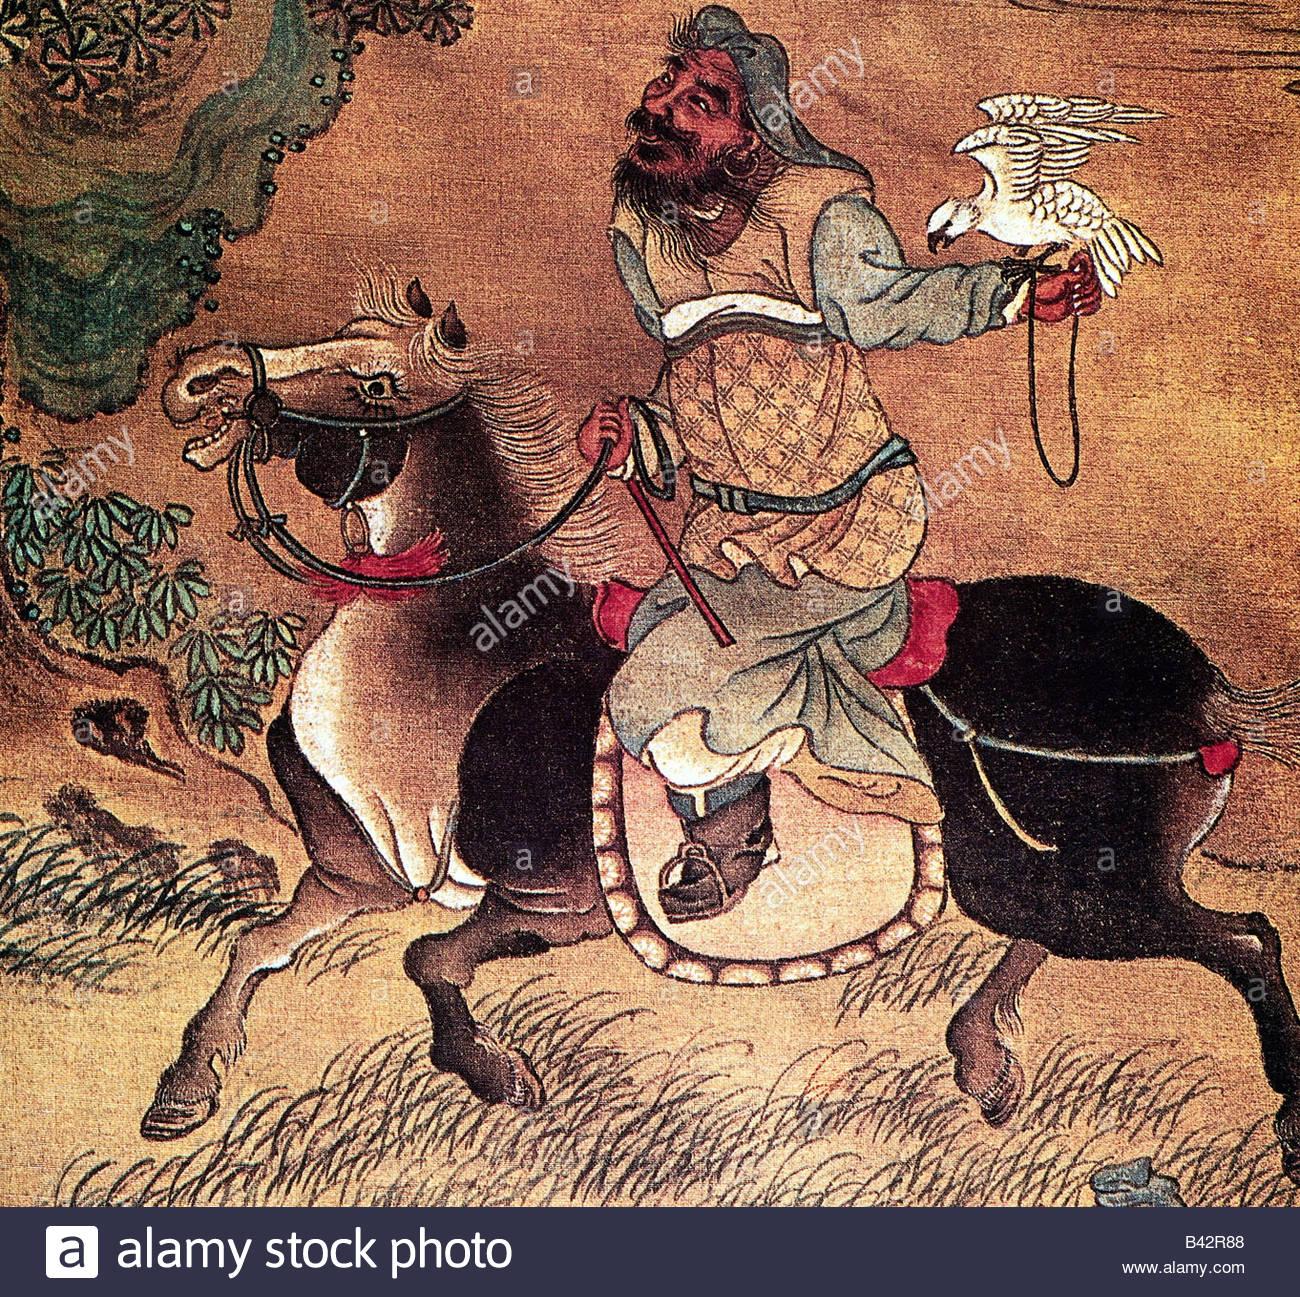 genghis-khan-1155-1881227-mongol-ruler-h